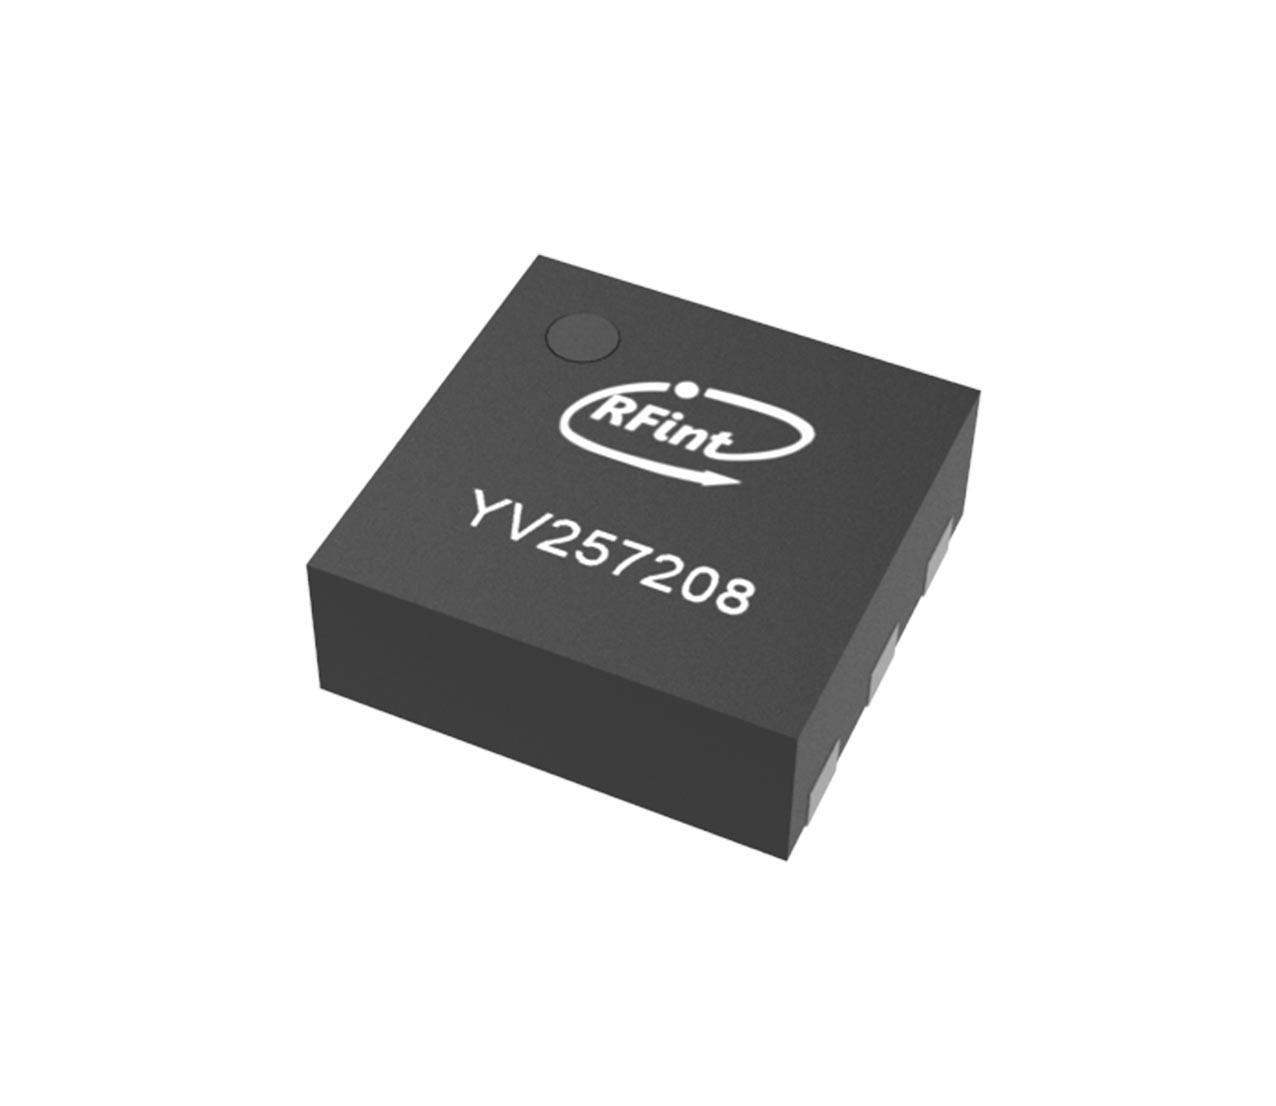 YV257208